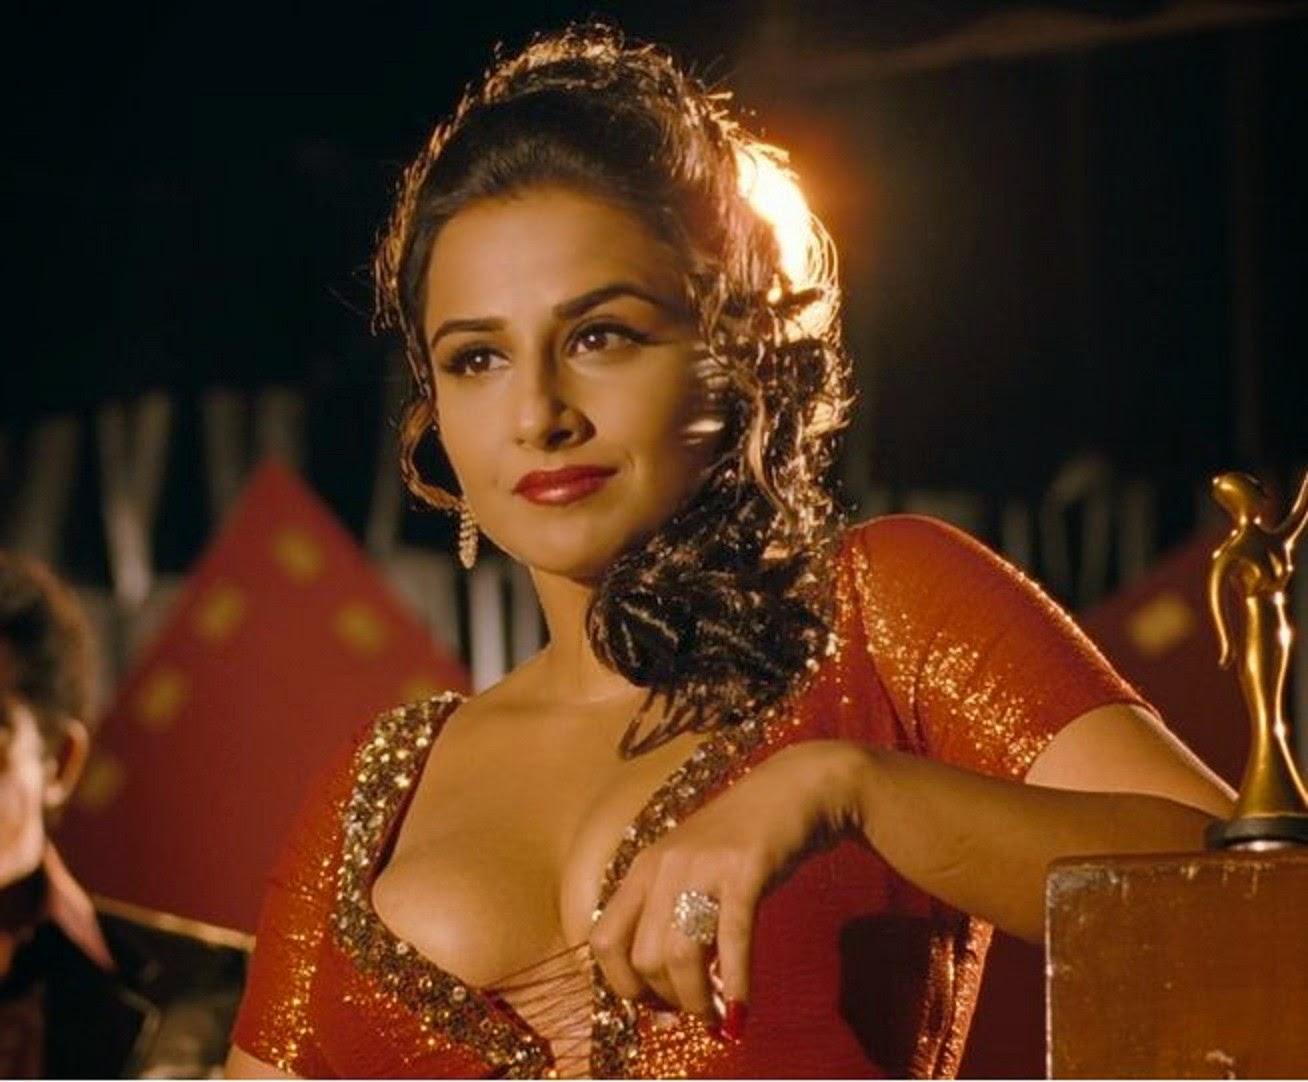 Vidya Balan looking in red saree hot and sexy wallpaper photo